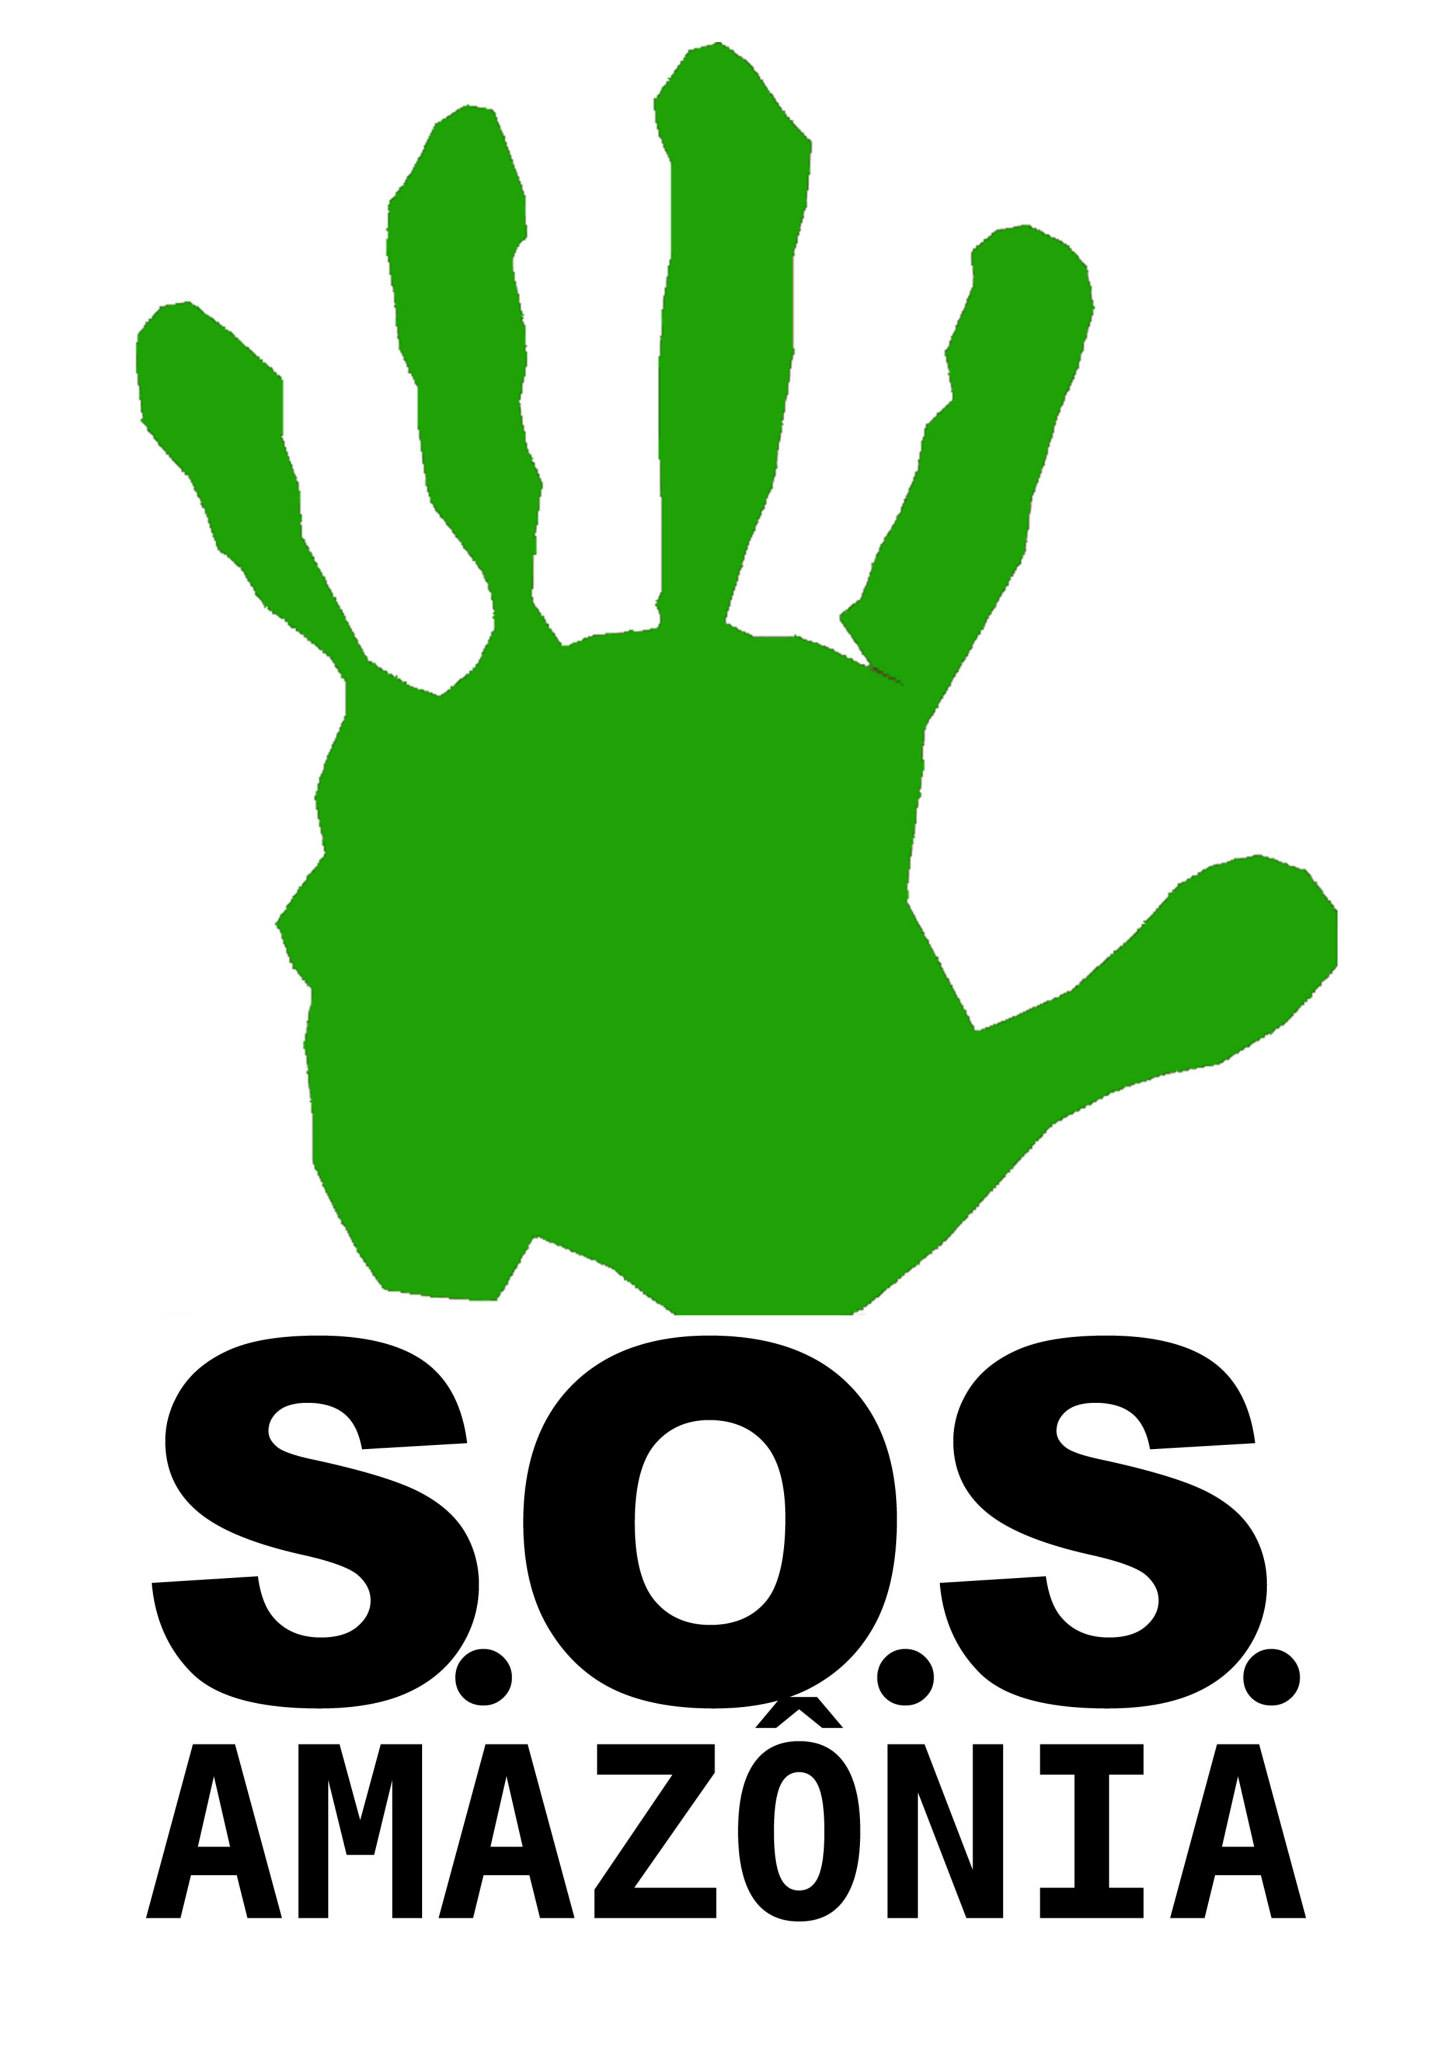 Top Mondial 2014 : 'S.O.S AMAZÔNIA / STOP BELO MONTE!', soutien  NI25